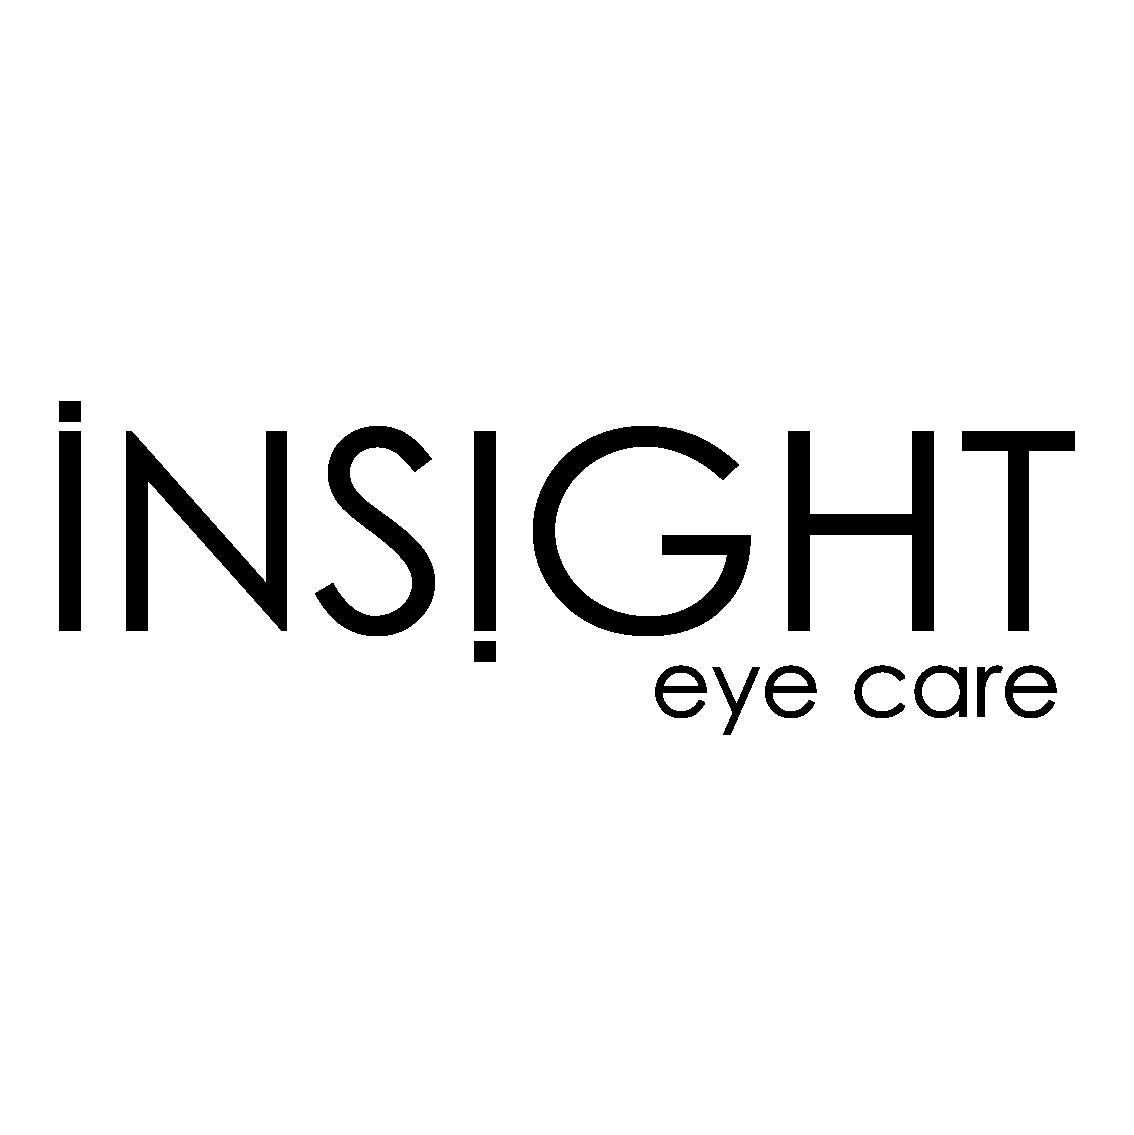 insight-eye-care-logo-2016